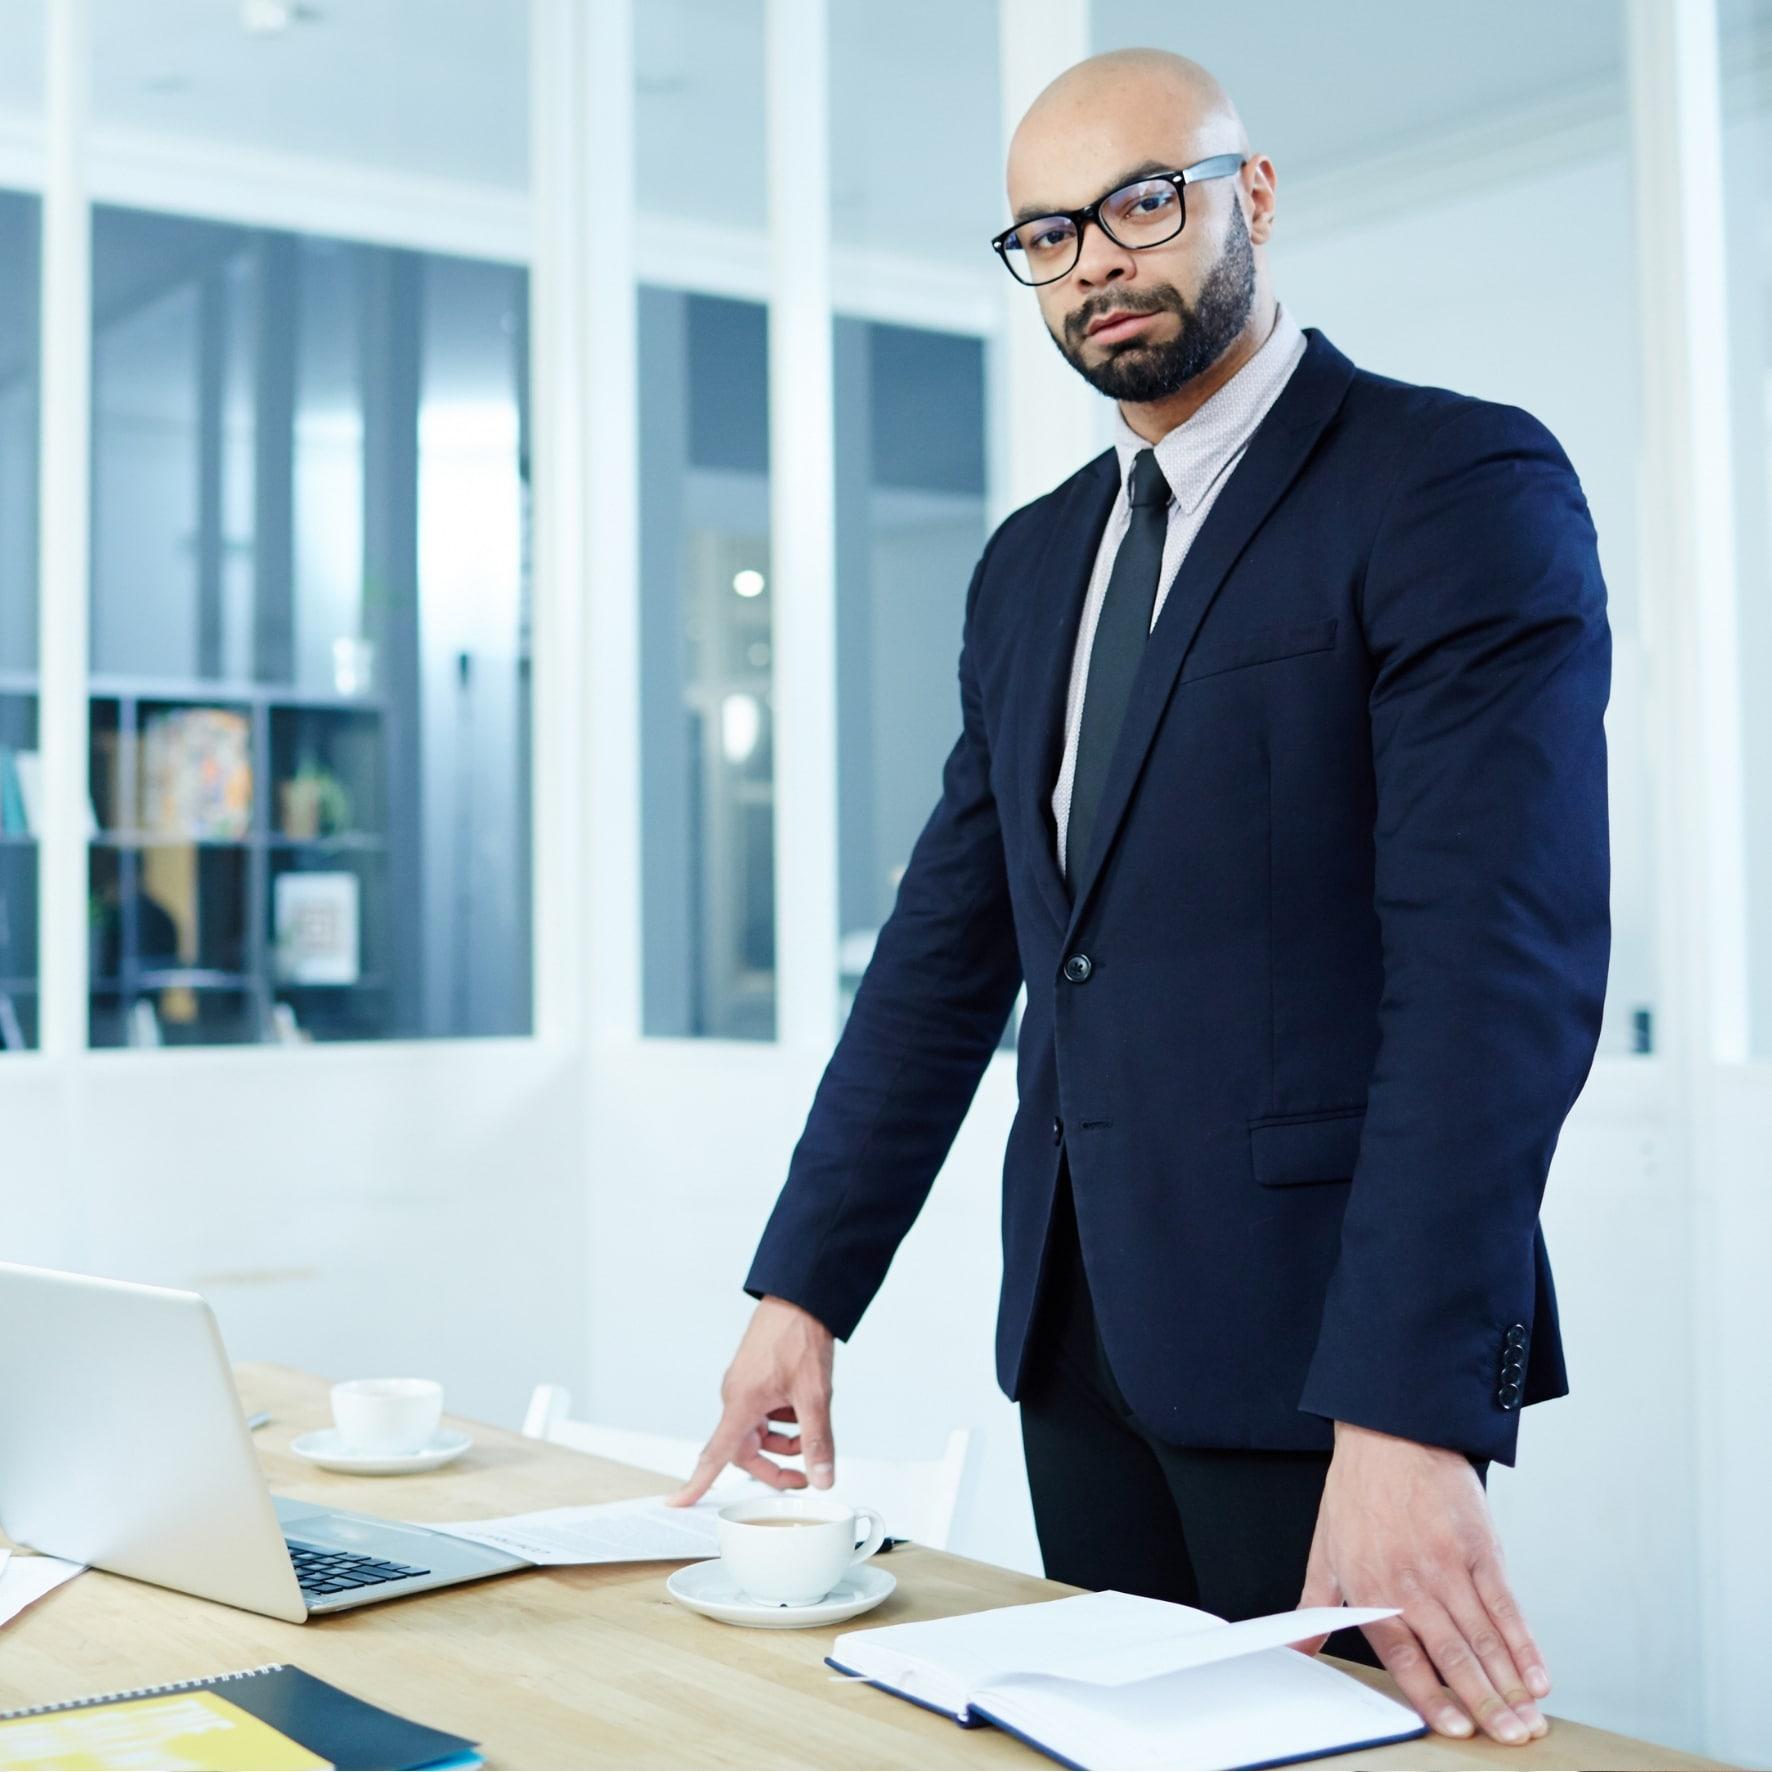 Adaptive Leadership - Leading in a Disruptive World